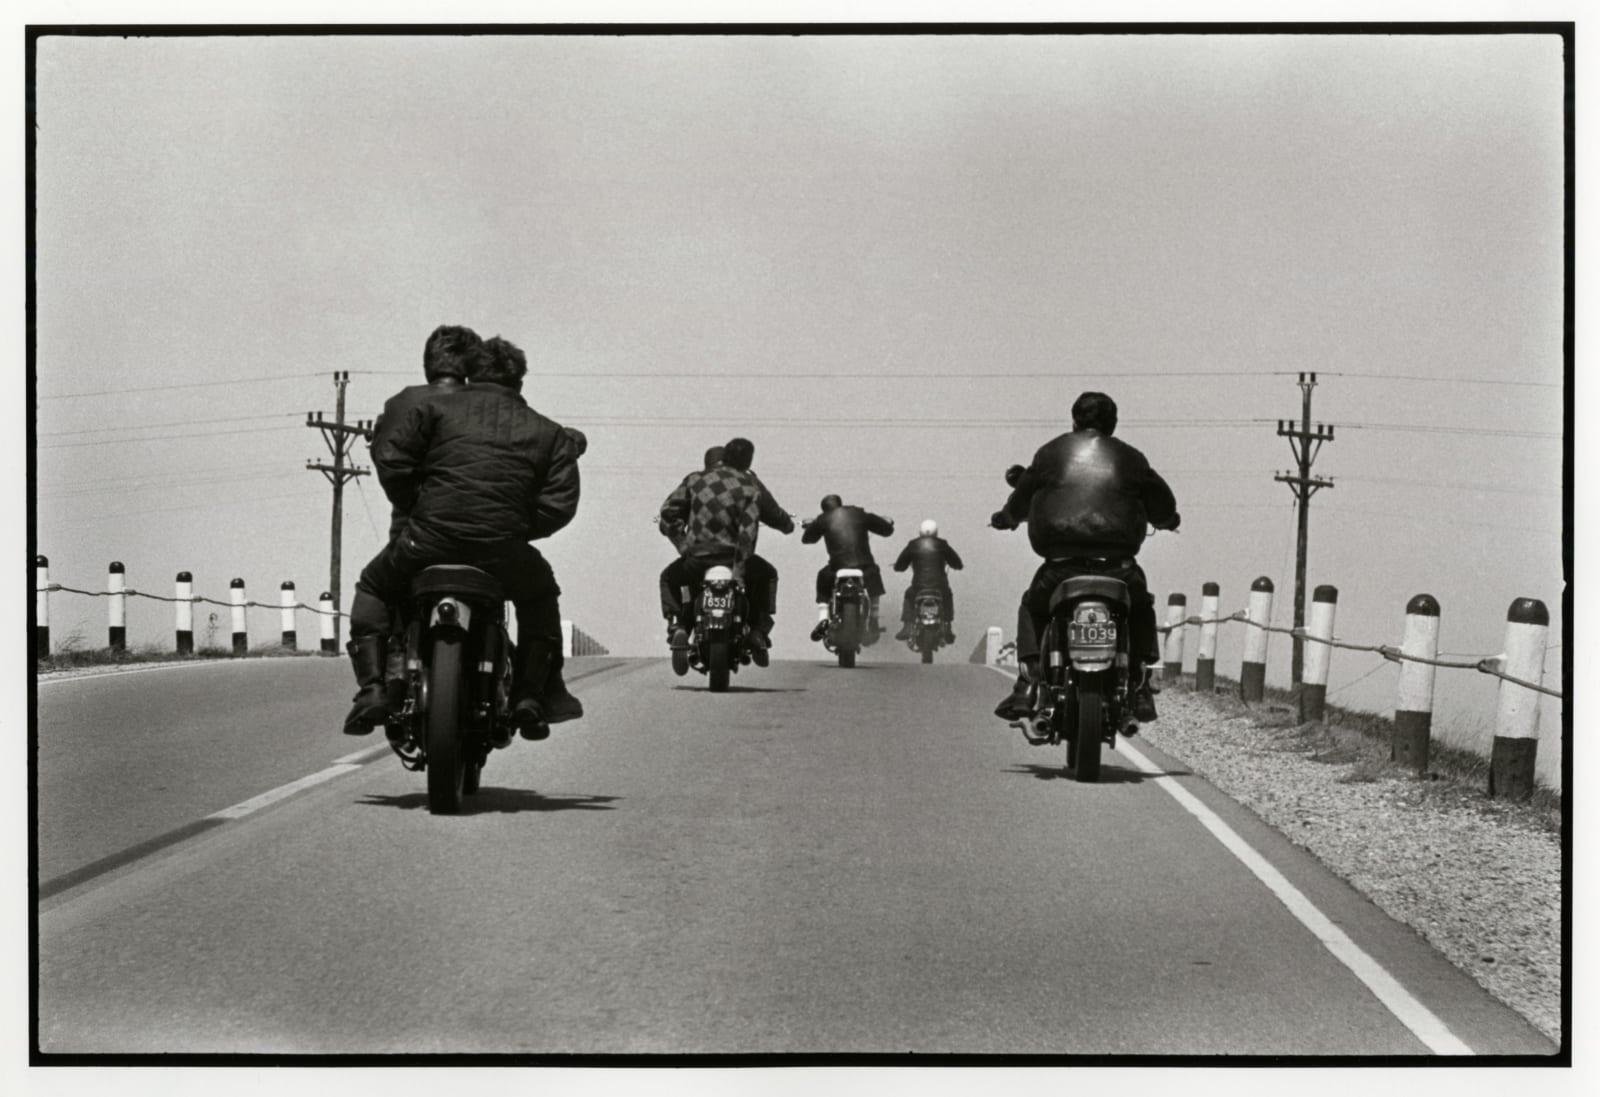 Danny Lyon - Route 12, Wisconsin, 1963